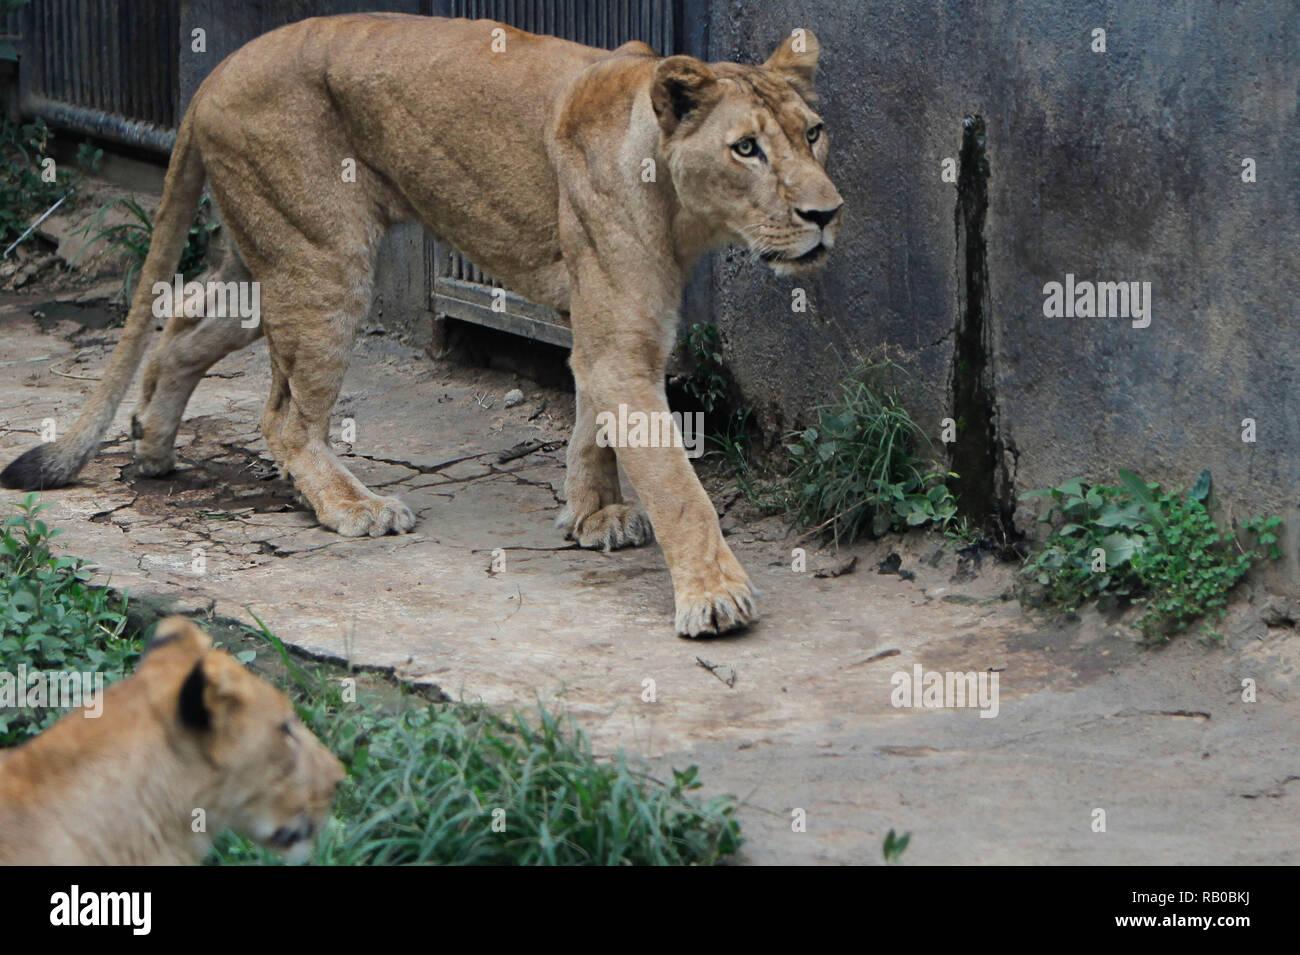 A Lioness Is Seen In The Batu Secret Zoo Modern Tourist Attractions